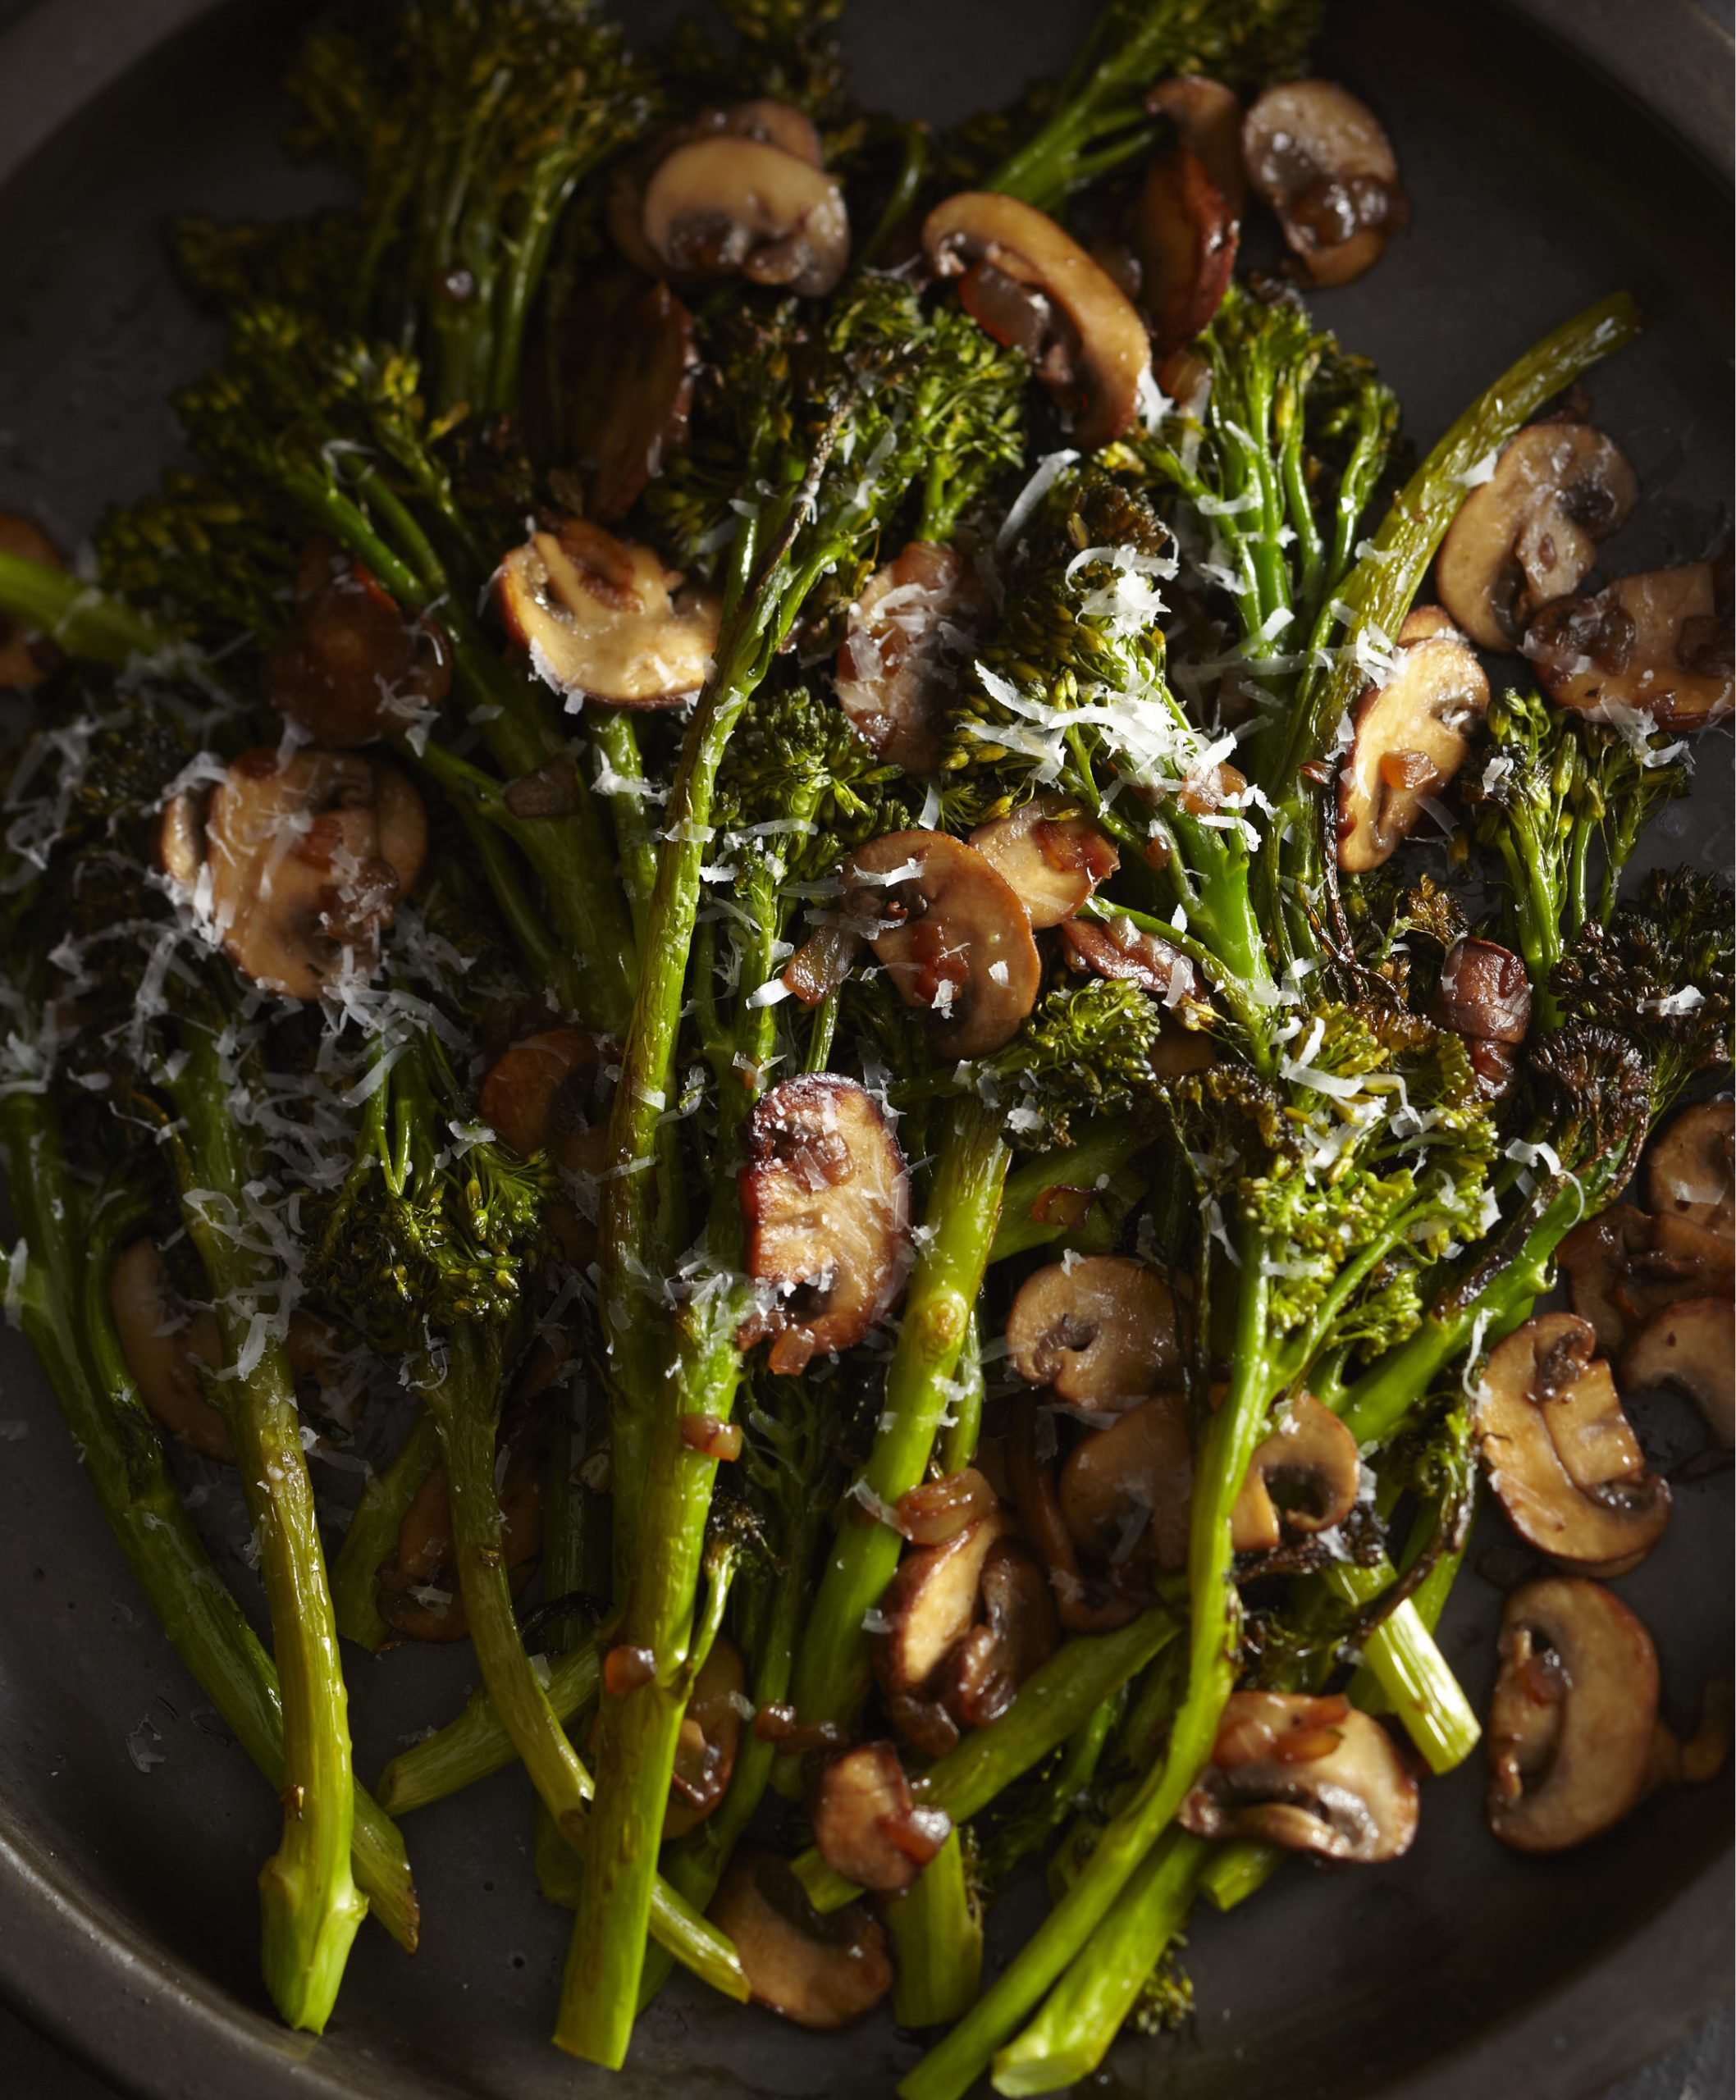 winey mushrooms